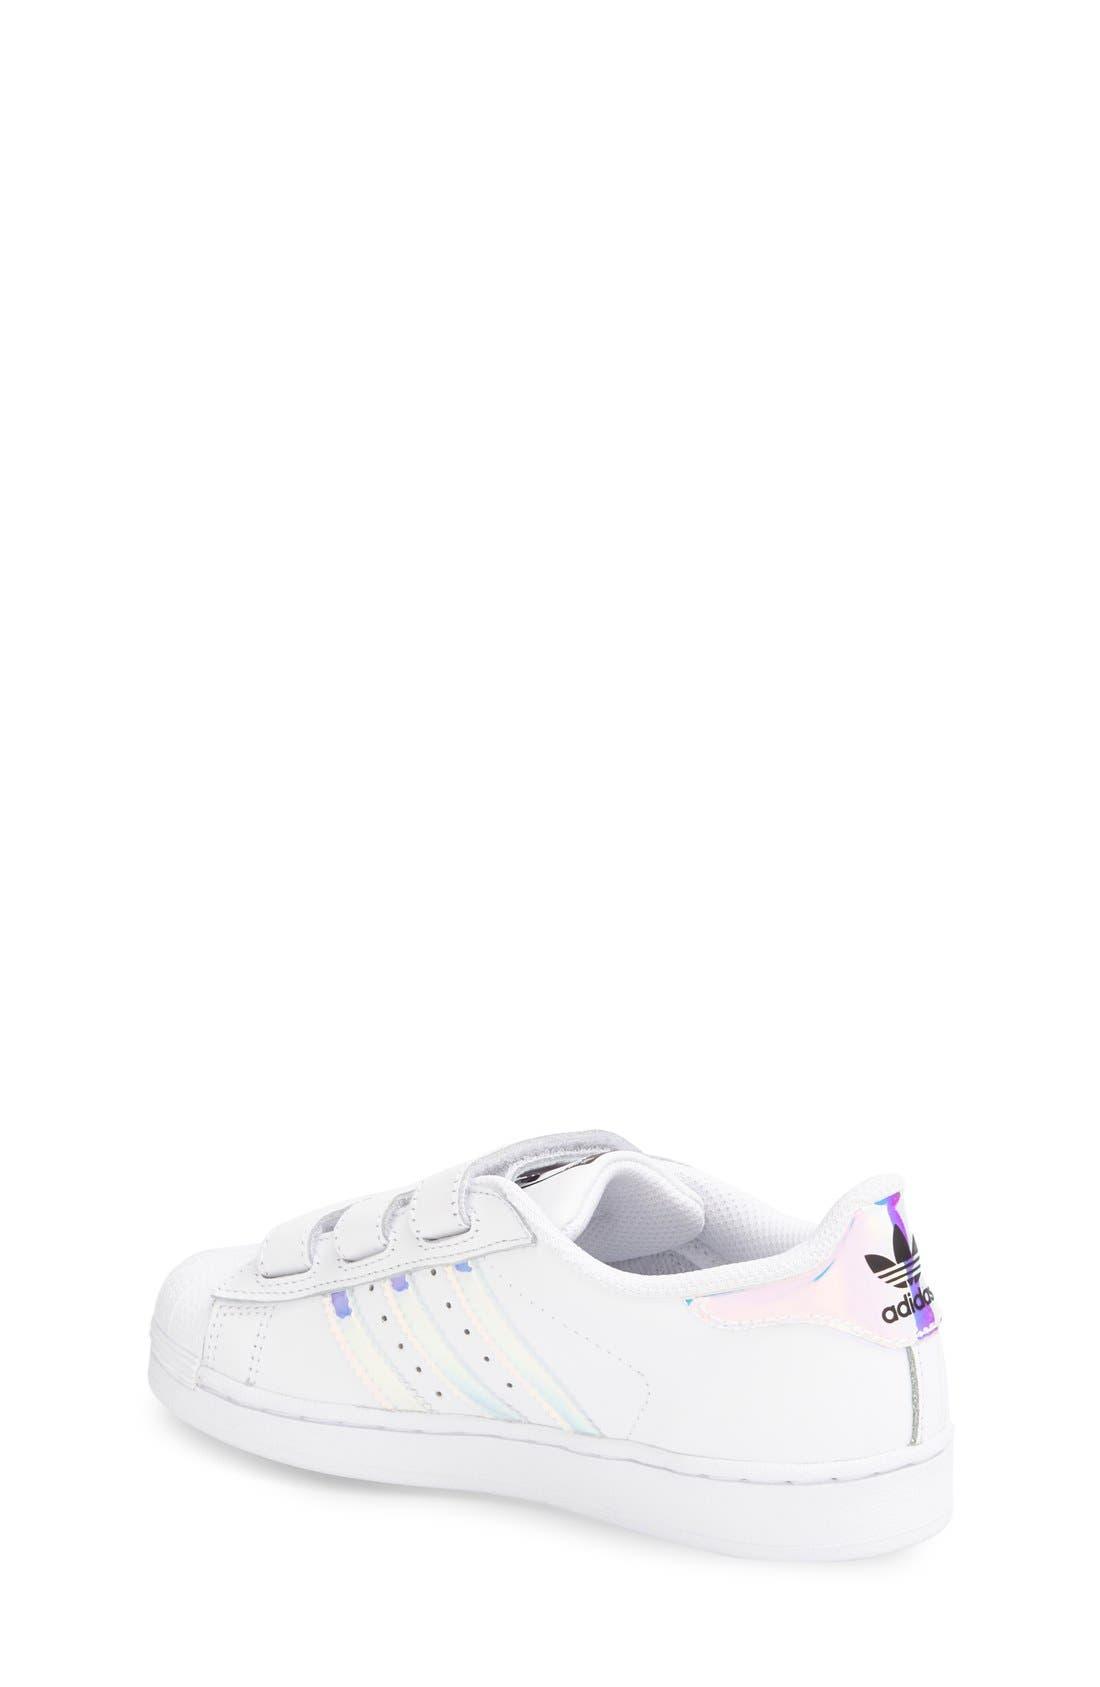 Superstar - Iridescent Sneaker,                             Alternate thumbnail 8, color,                             100